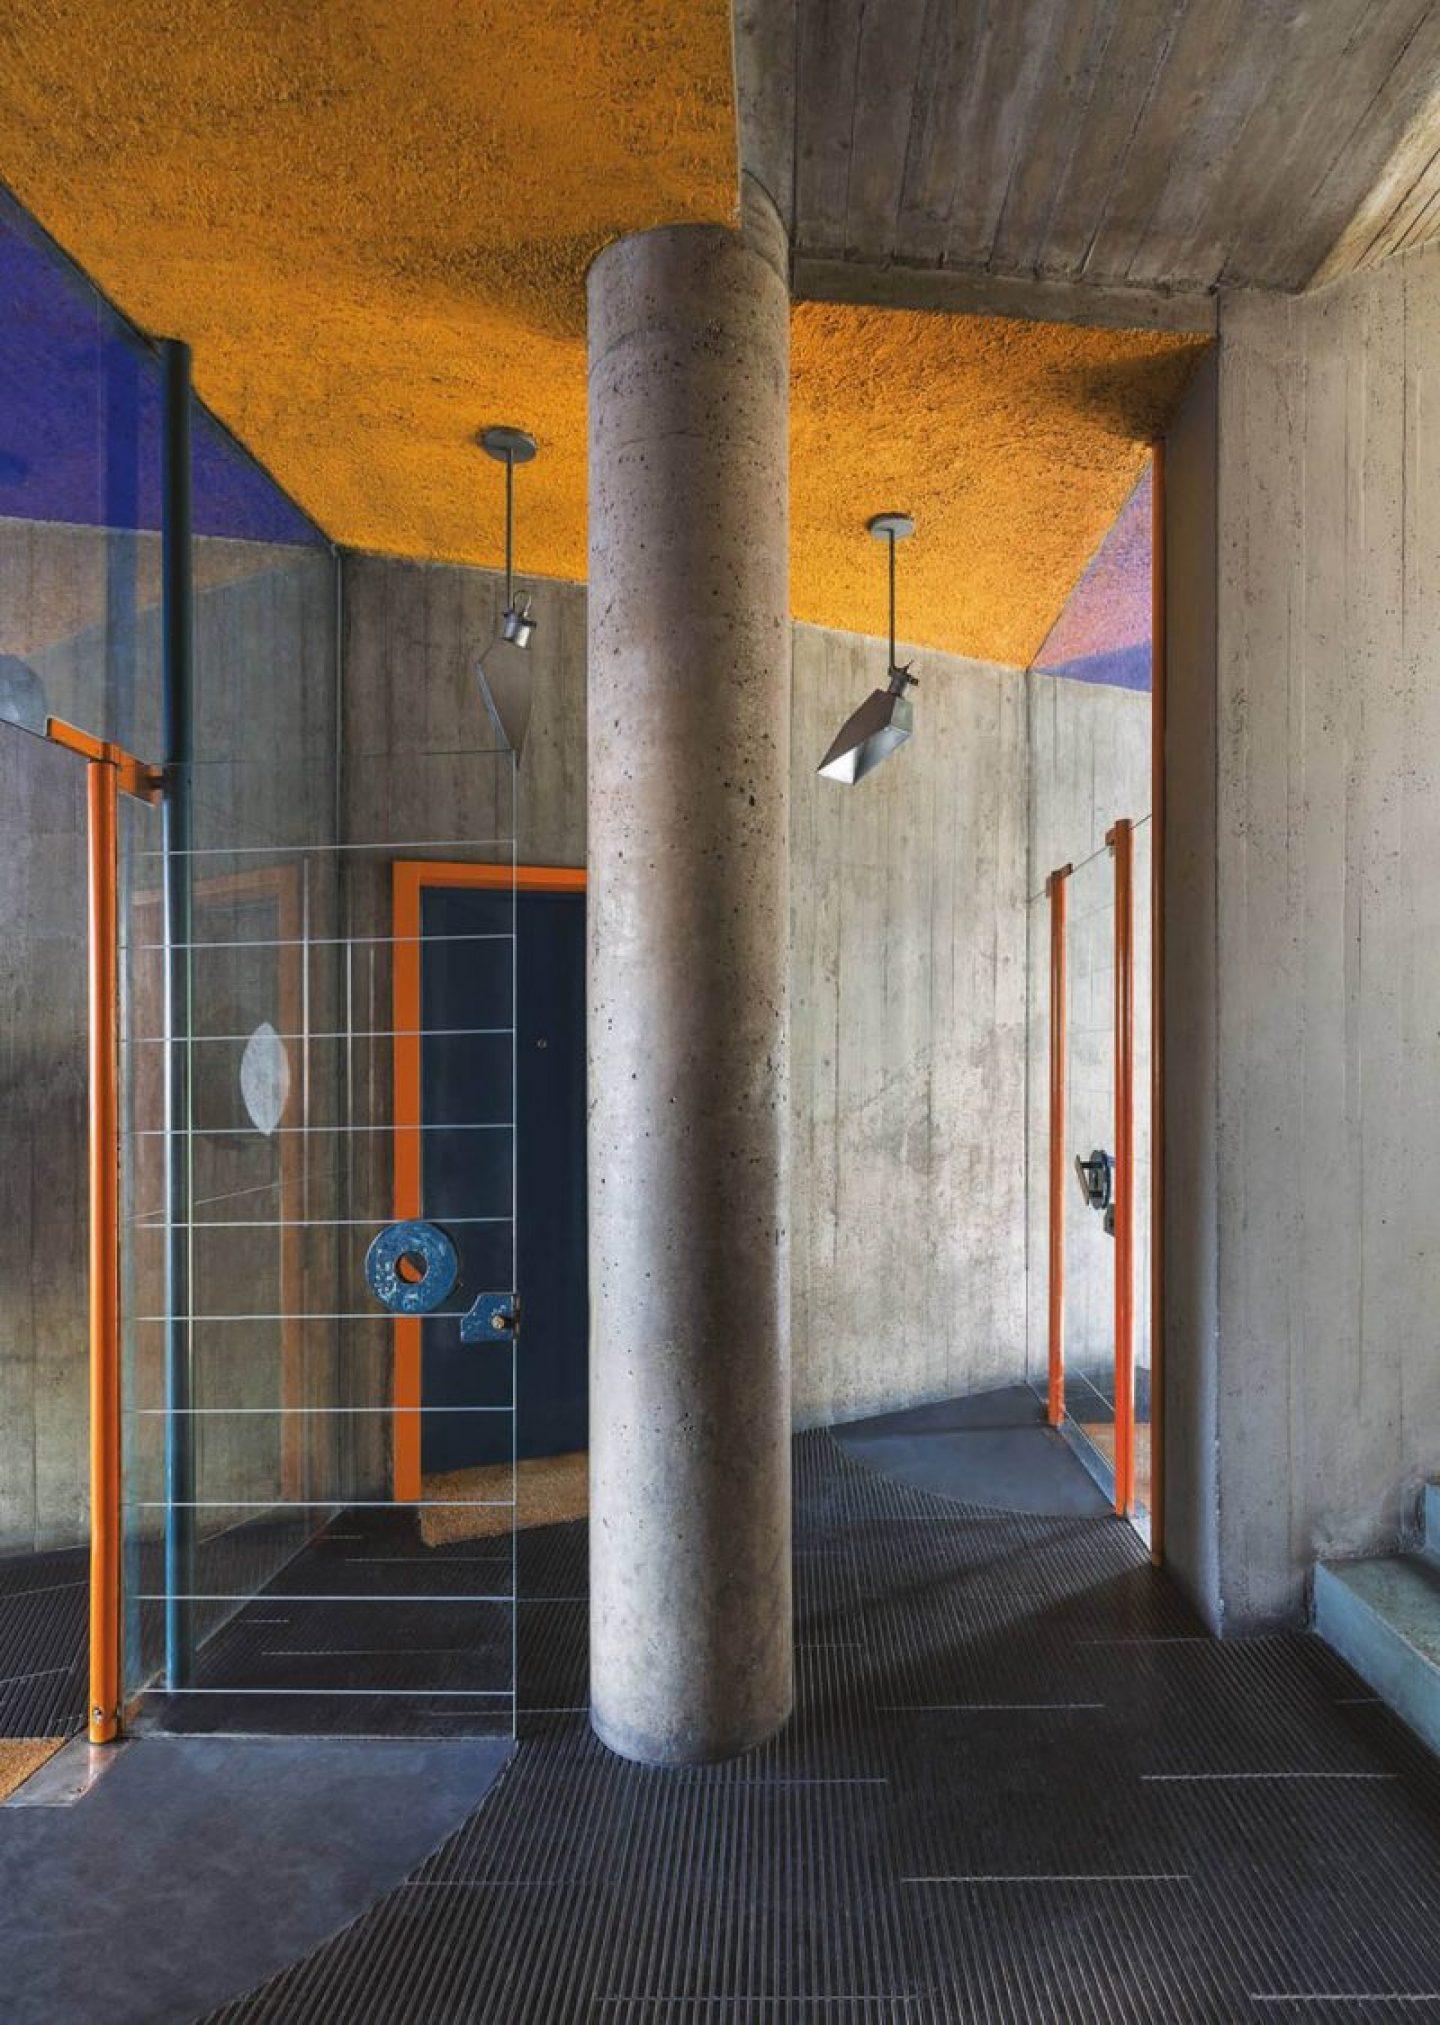 iGNANT_Architecture_Karl_Kolbitz_Taschen_Entryways_of_Milan_Ingressi_di_Milano_3